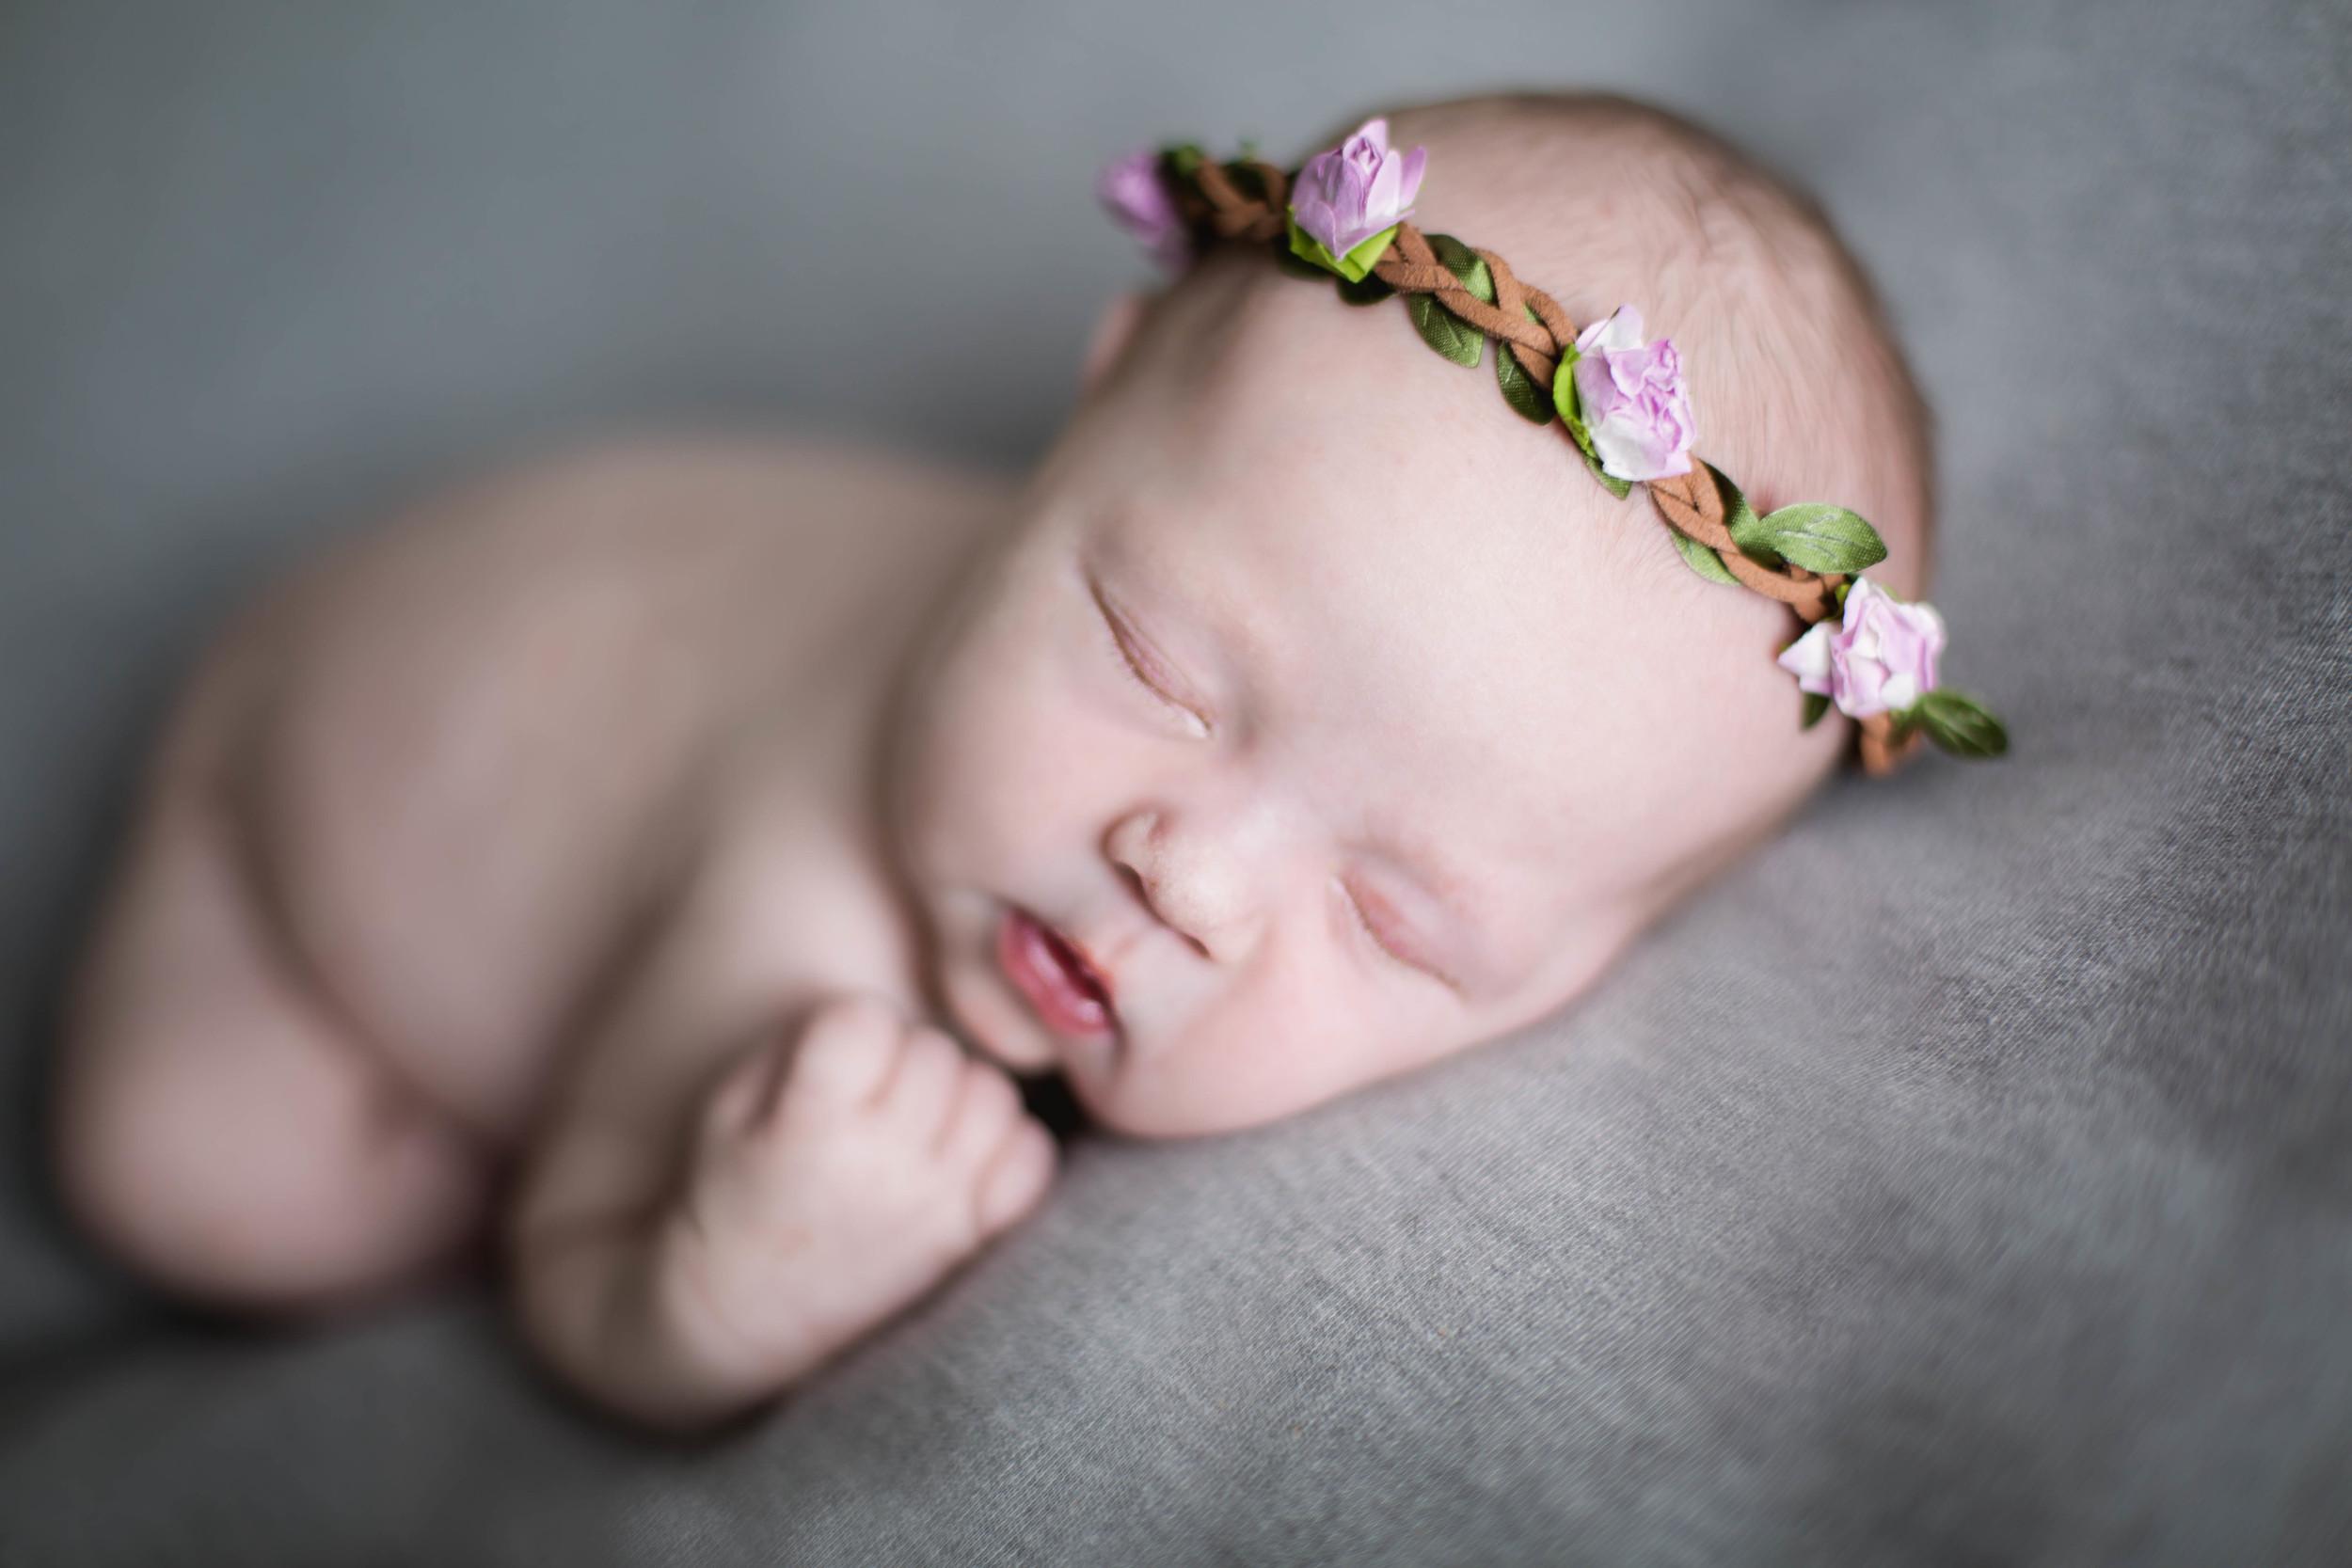 Baby-Monroe-4.jpg